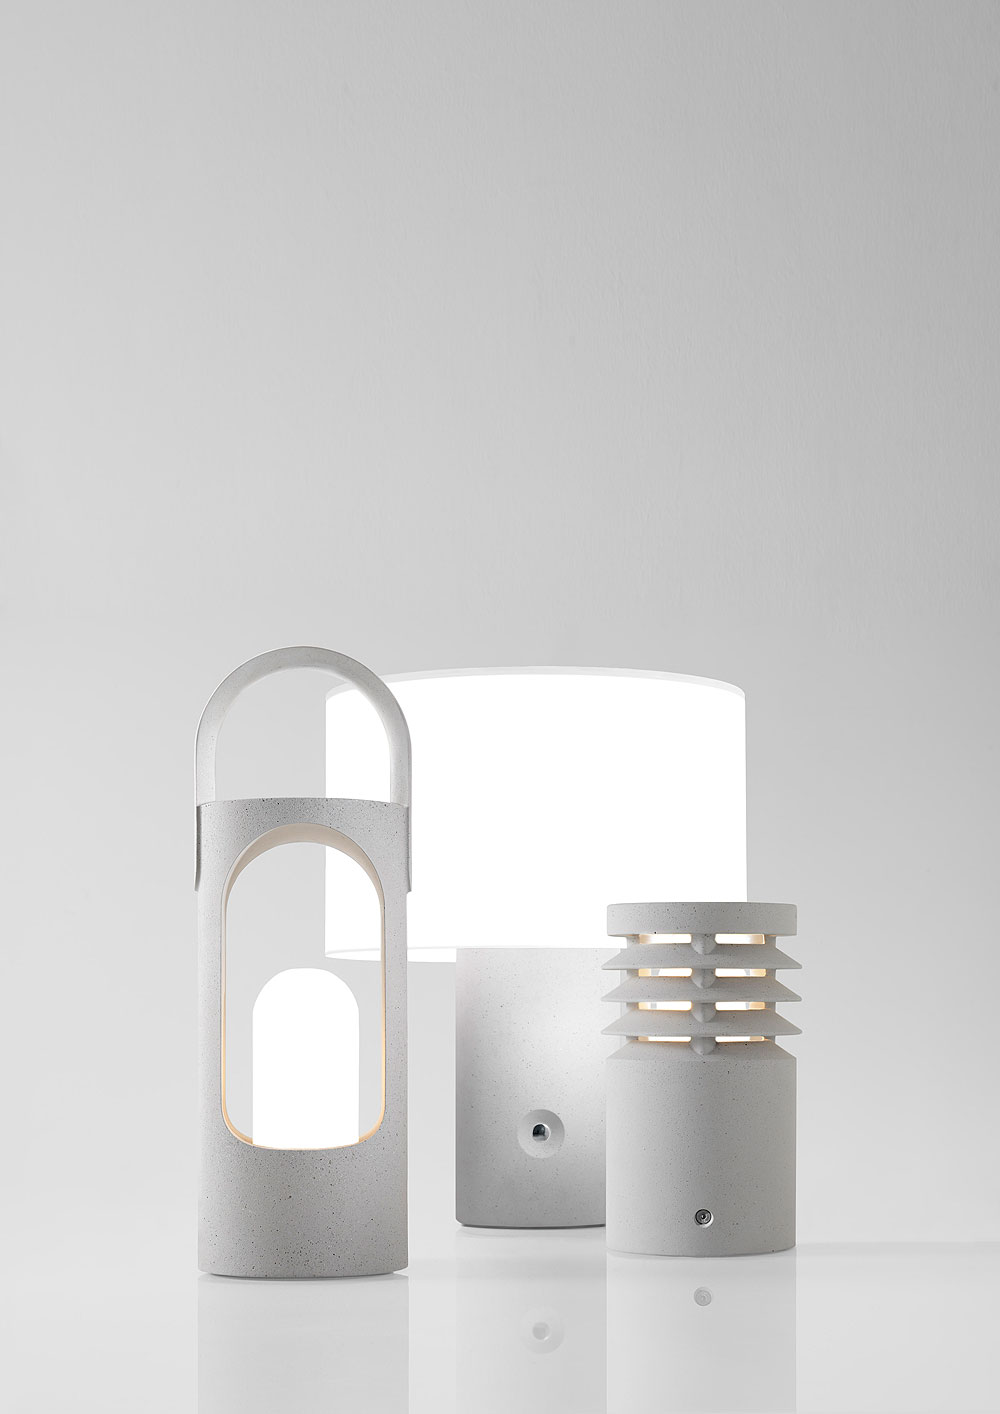 iluminacion-stones-ramon-ubeda-otto-canalda-metalarte (2)